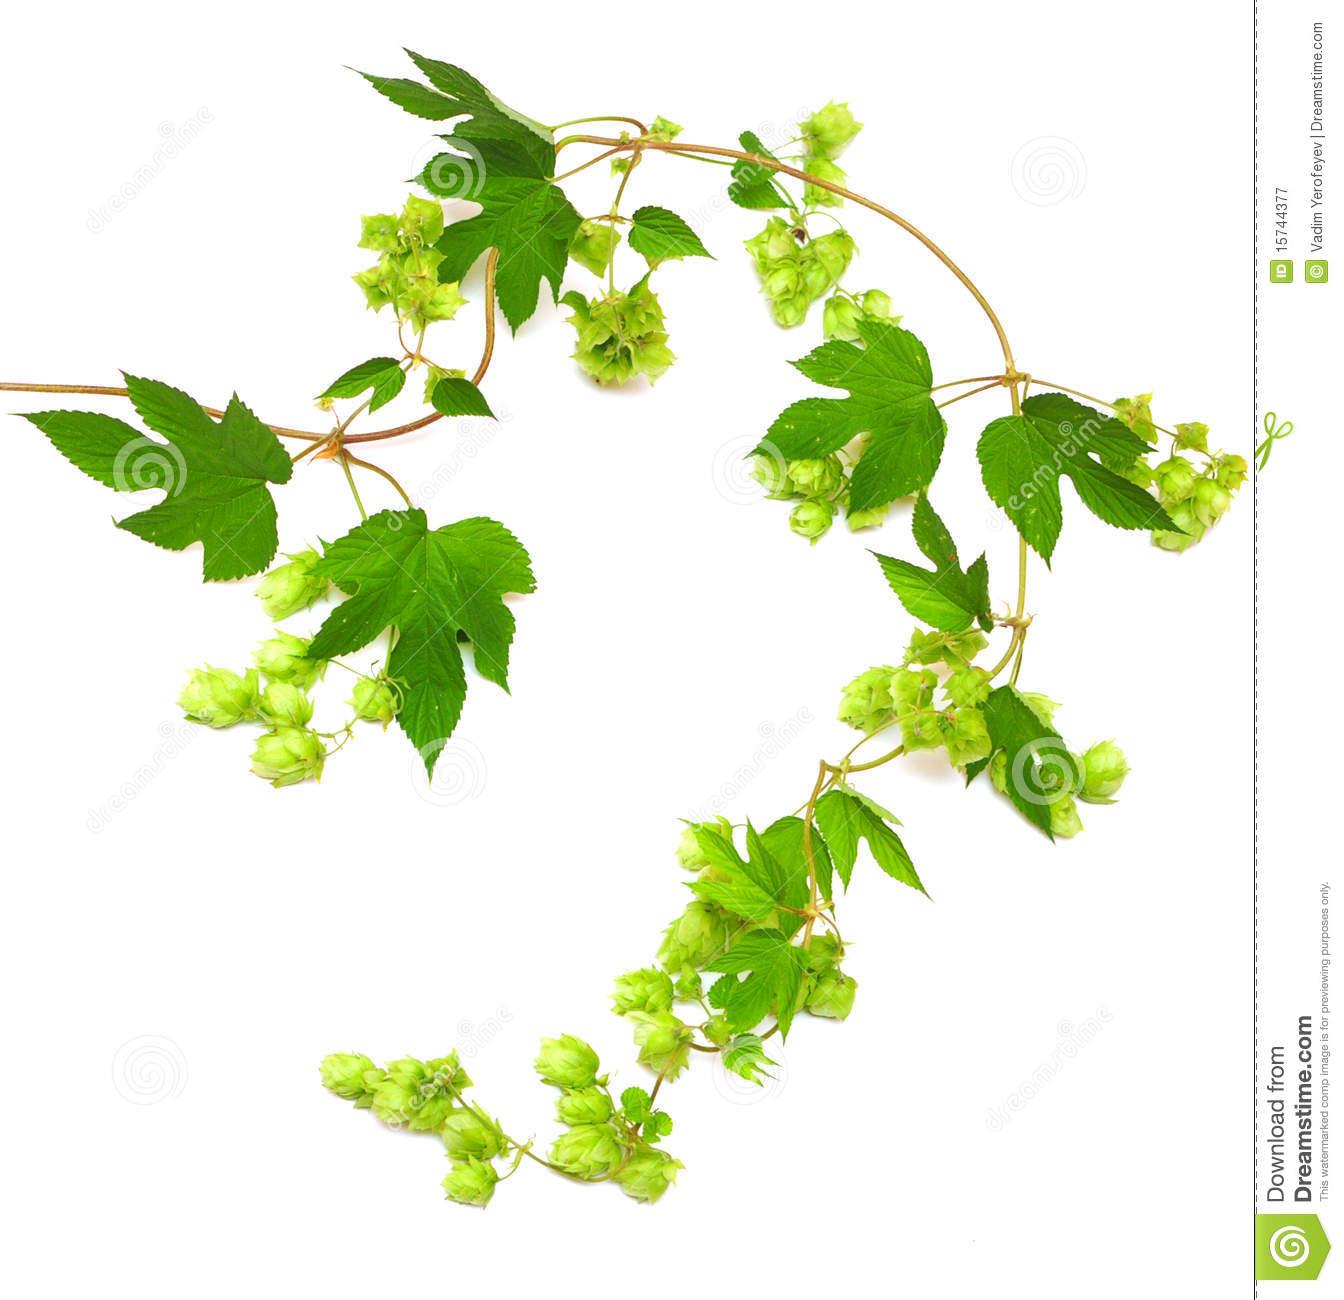 Hops vine clipart.